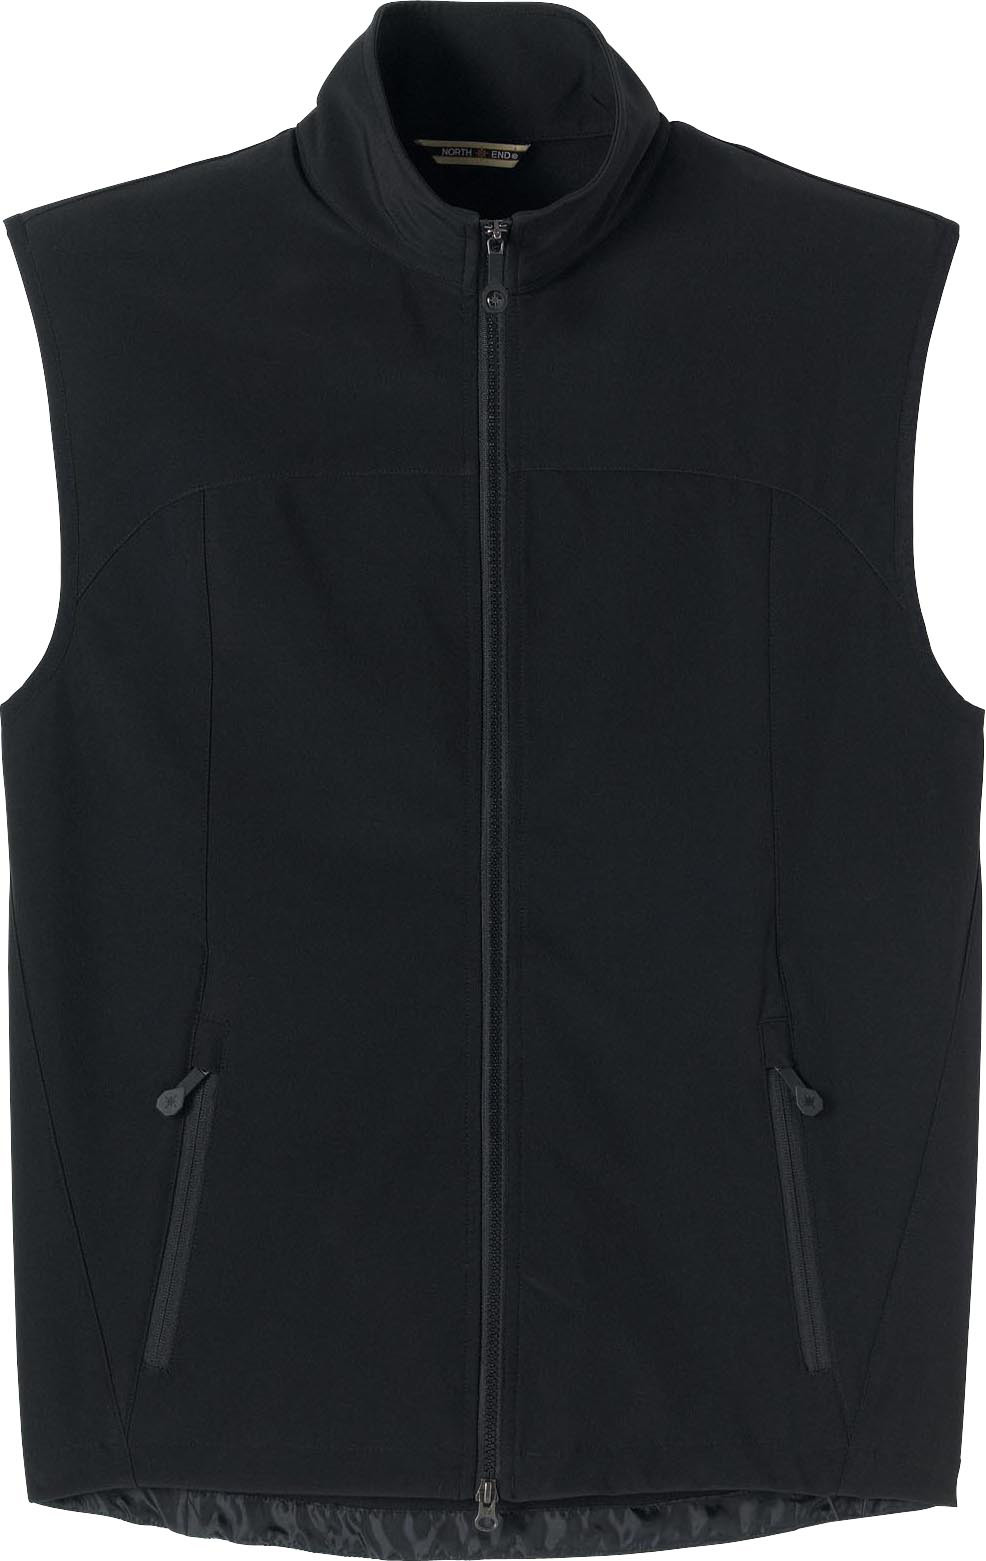 Ash City Soft Shells 88127 - Men's Soft Shell Performance Vest